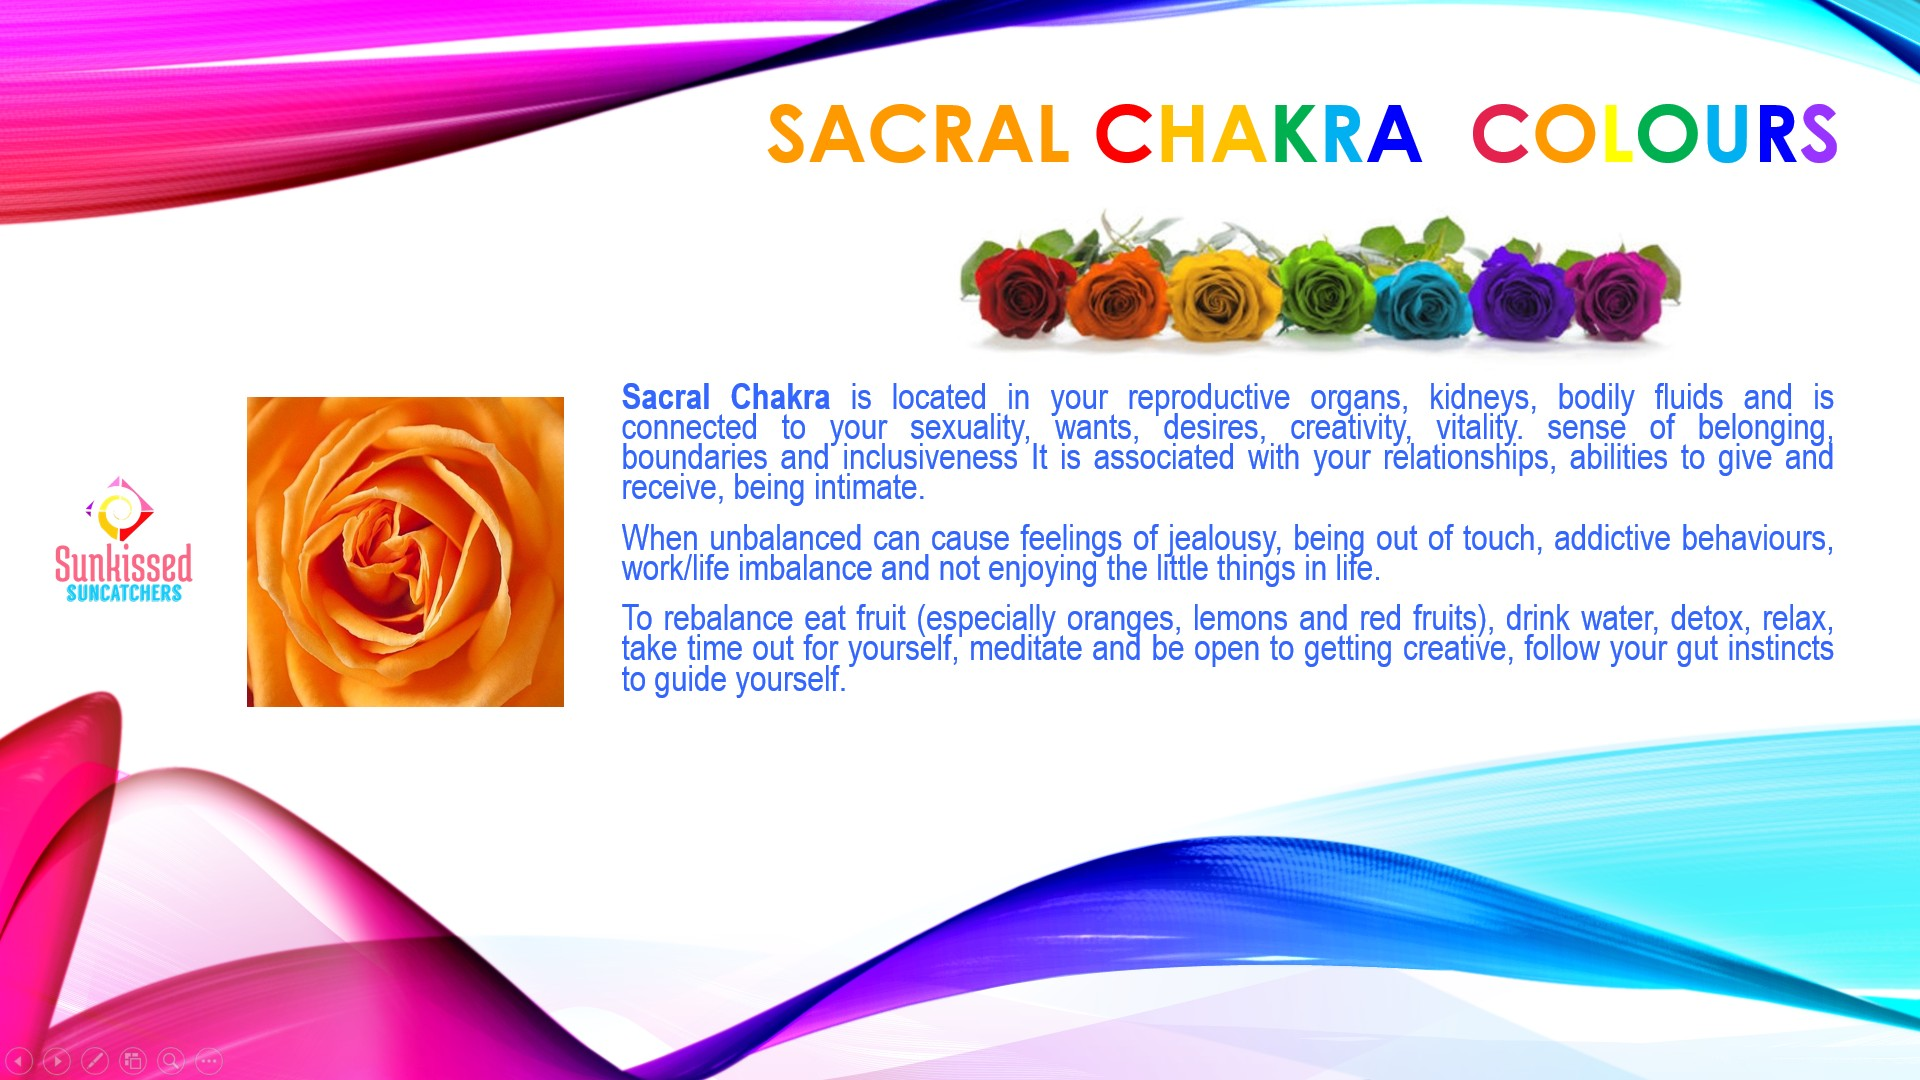 Sunkissed Suncatchers 3 Sacral Chakra Colours